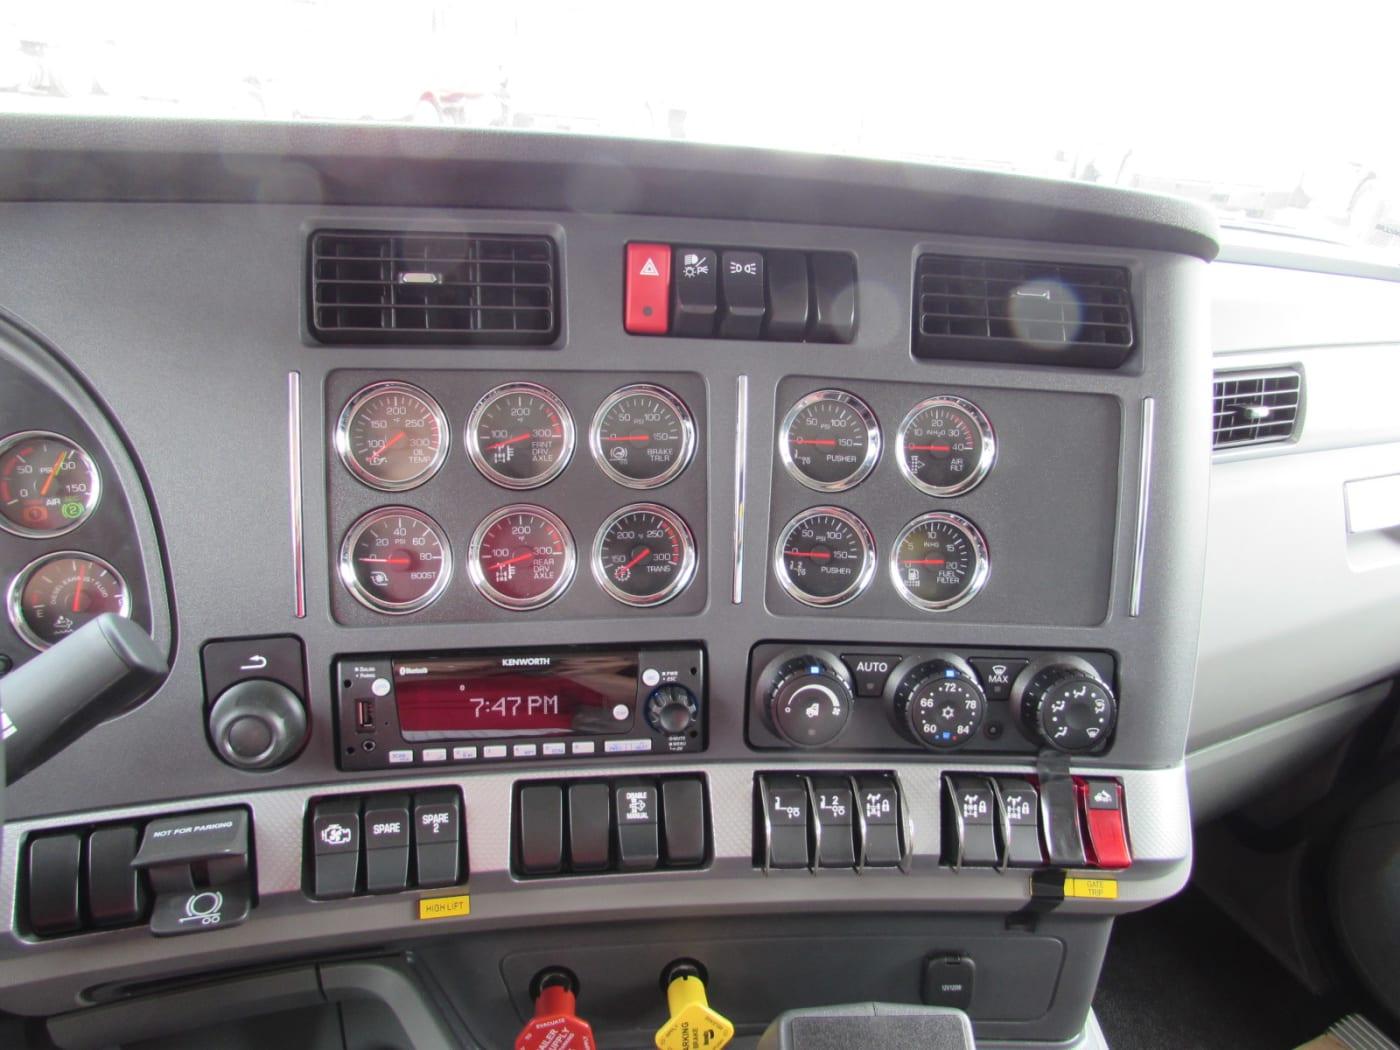 2022 Kenworth T880 NJ481609 full